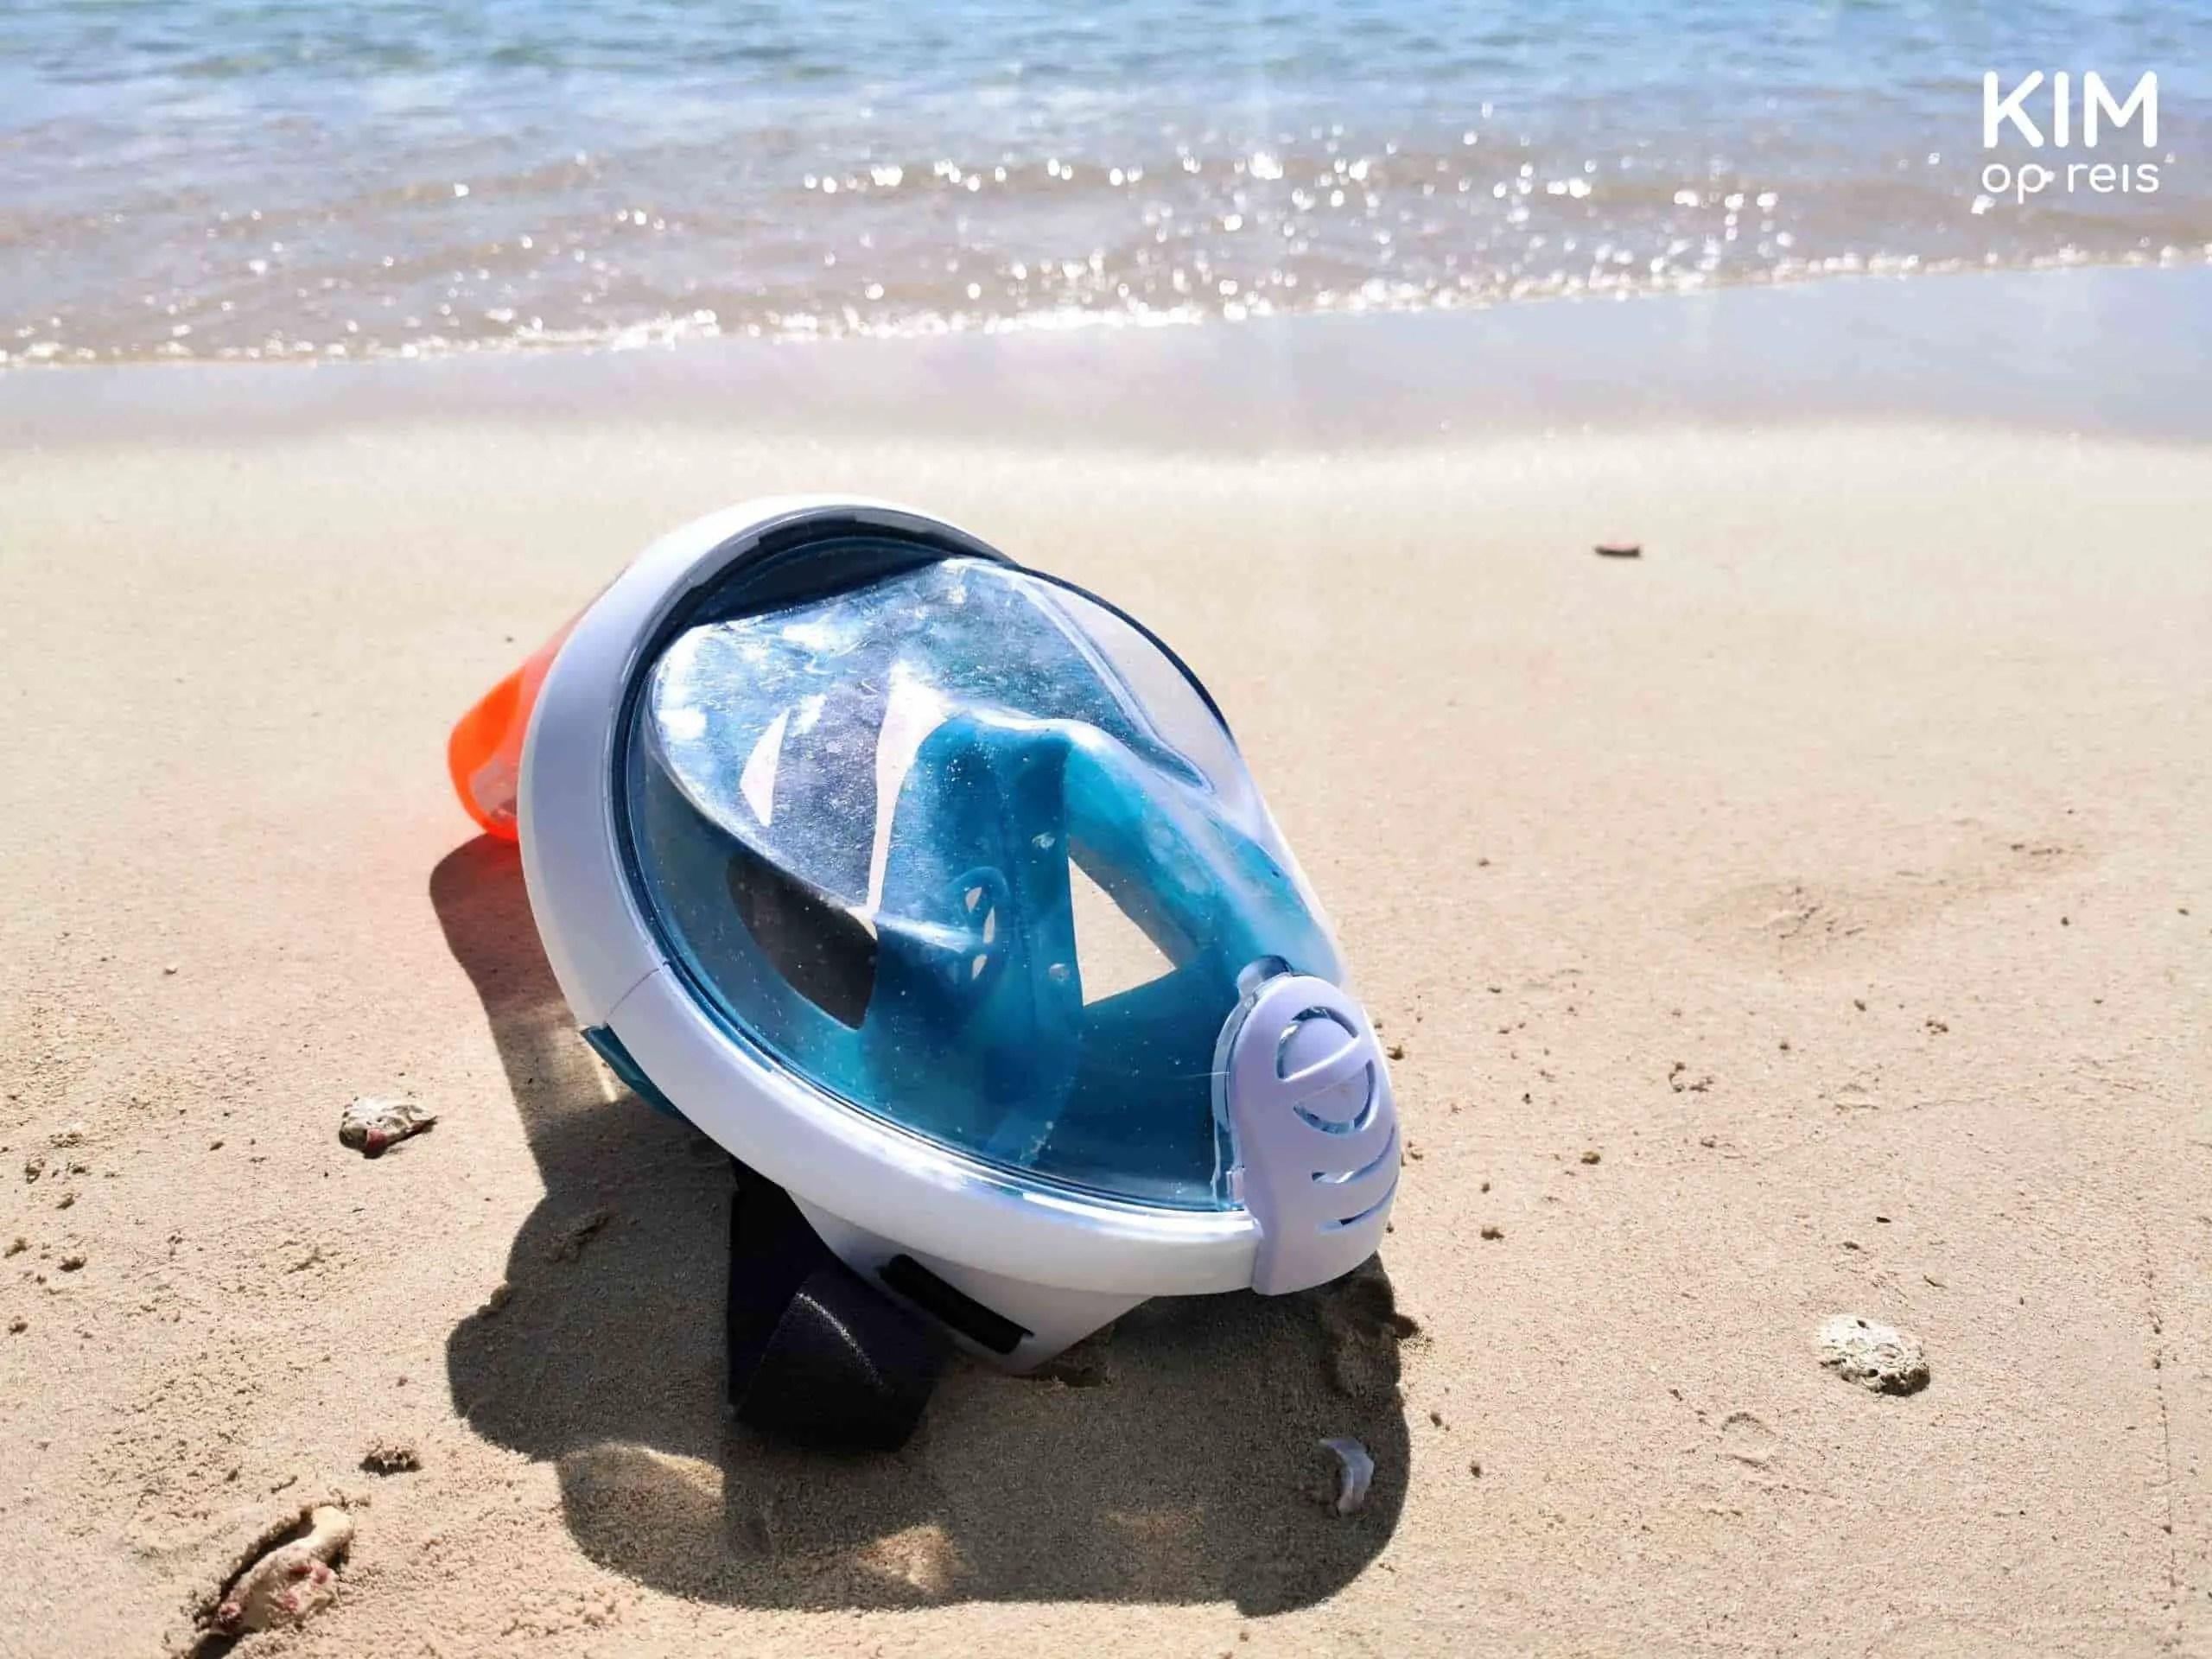 snorkelmasker Curaçao: blauw snorkelmasker ligt op het strand